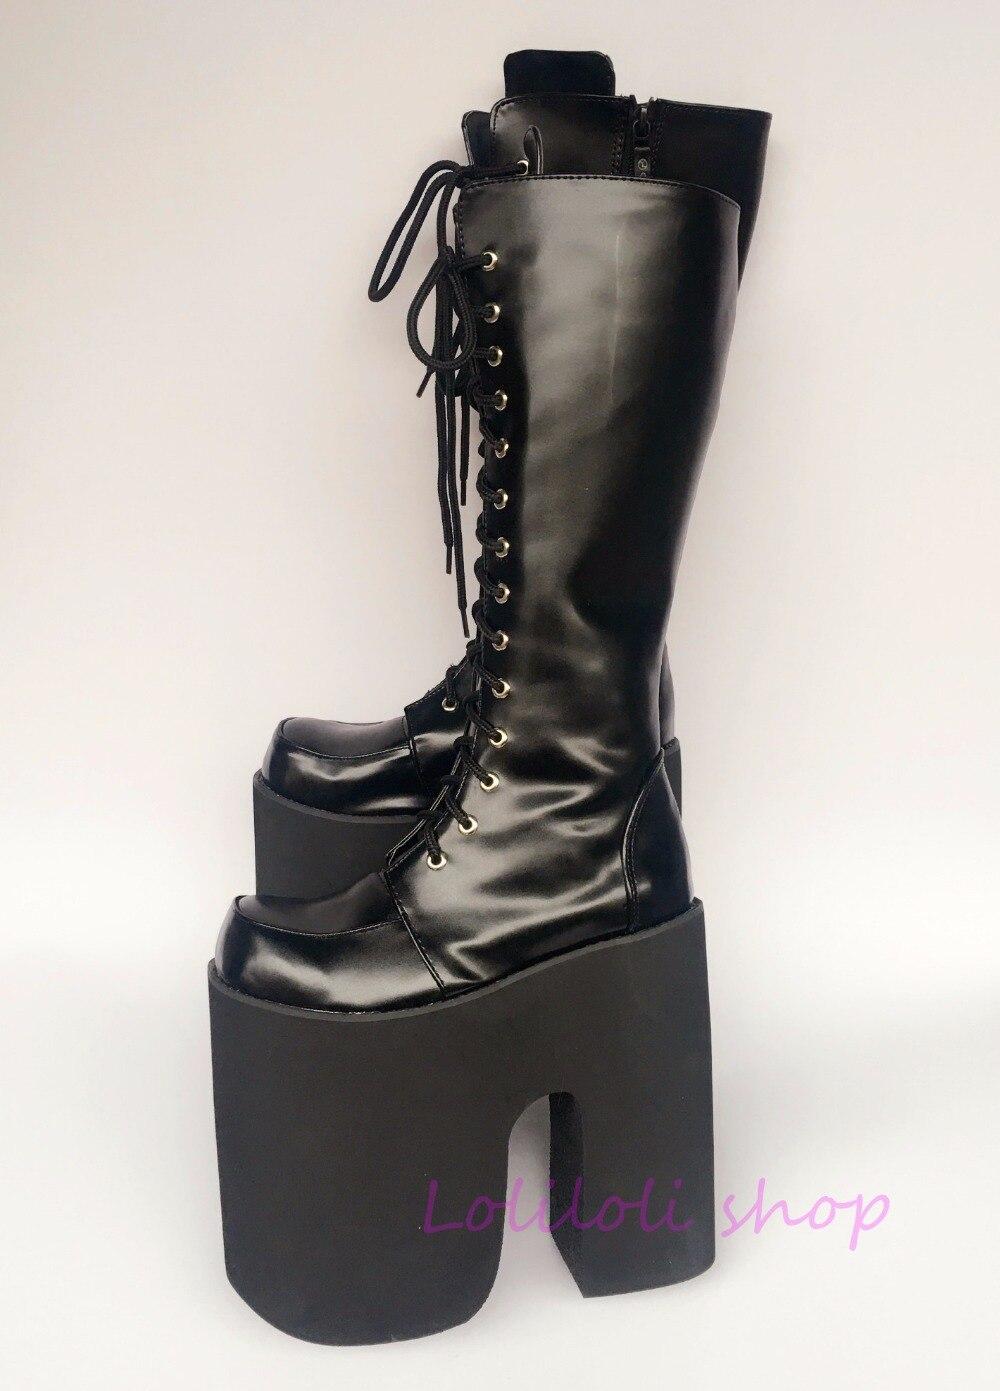 Princess sweet lolita shoes loliloli yoyo Japanese design custom big size cool bright skin Black lace-up knee-high boots 9712